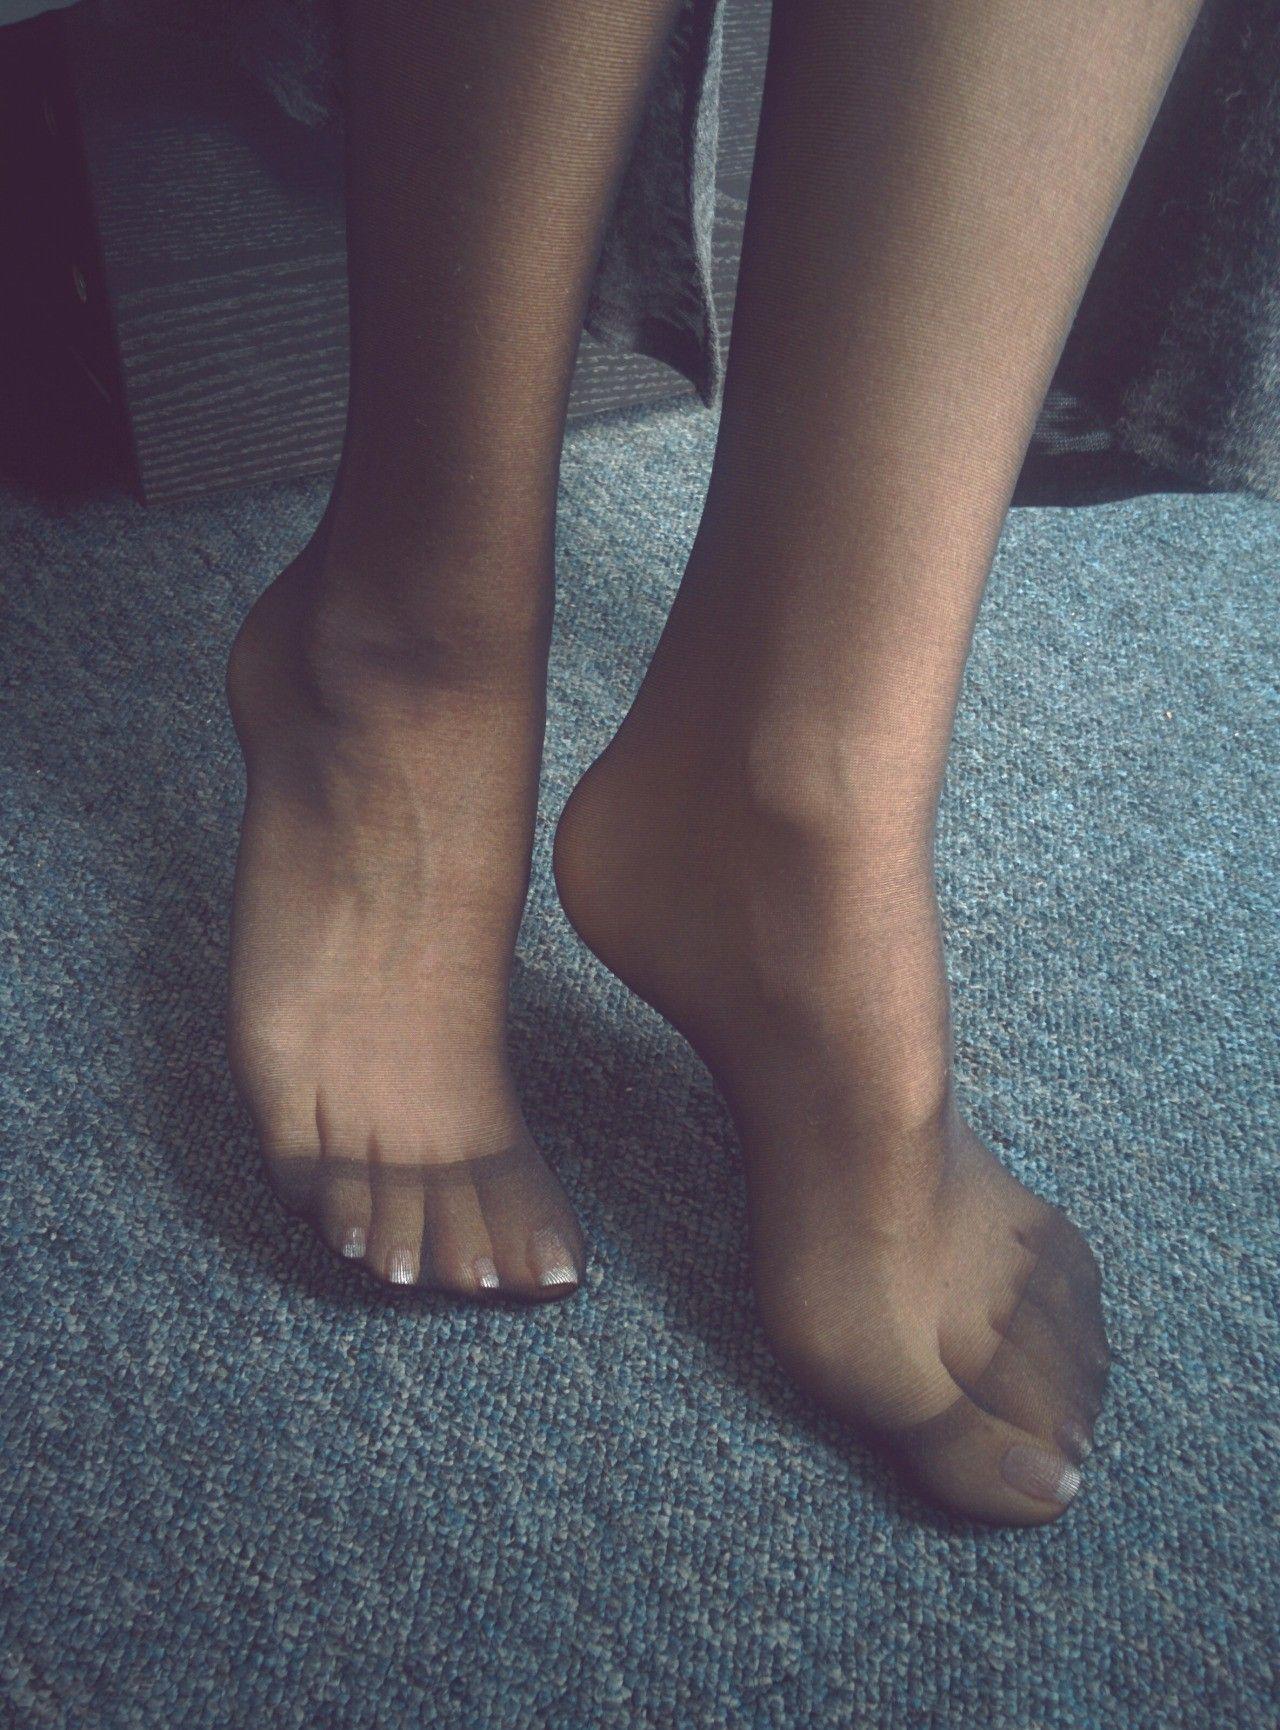 Nude illinois girl photos